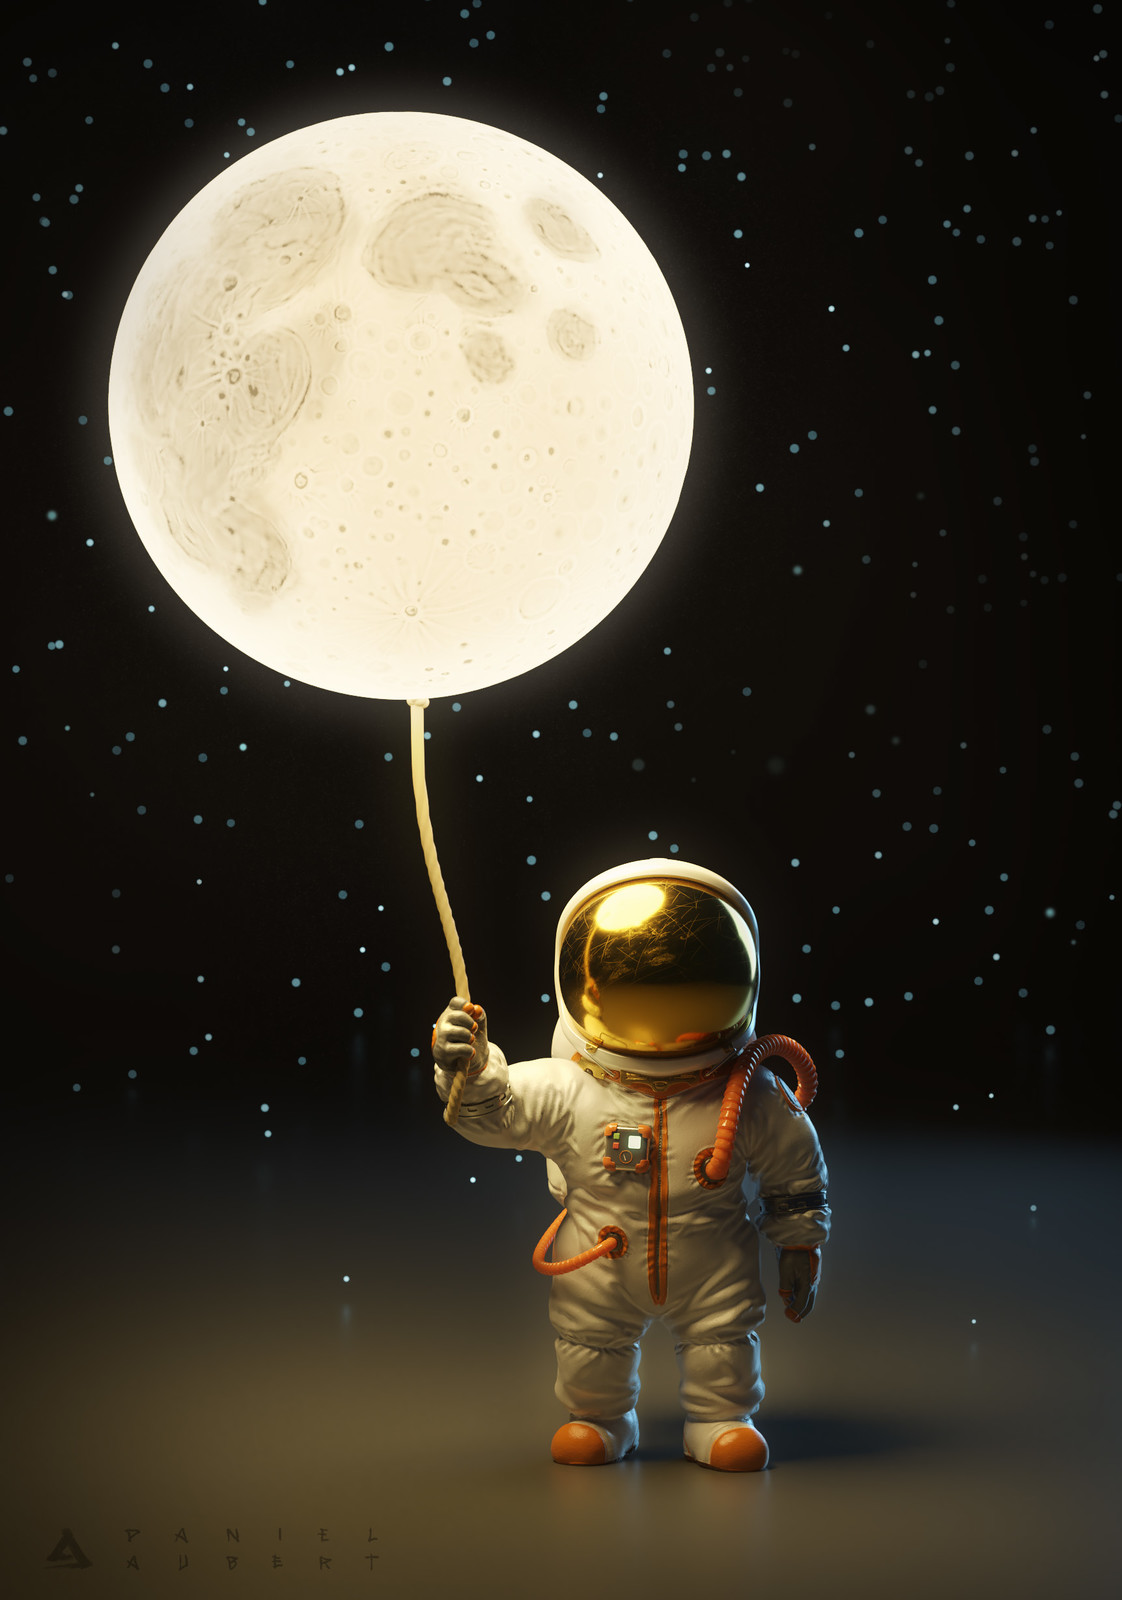 Lunar - Weekly CG Challenge #130